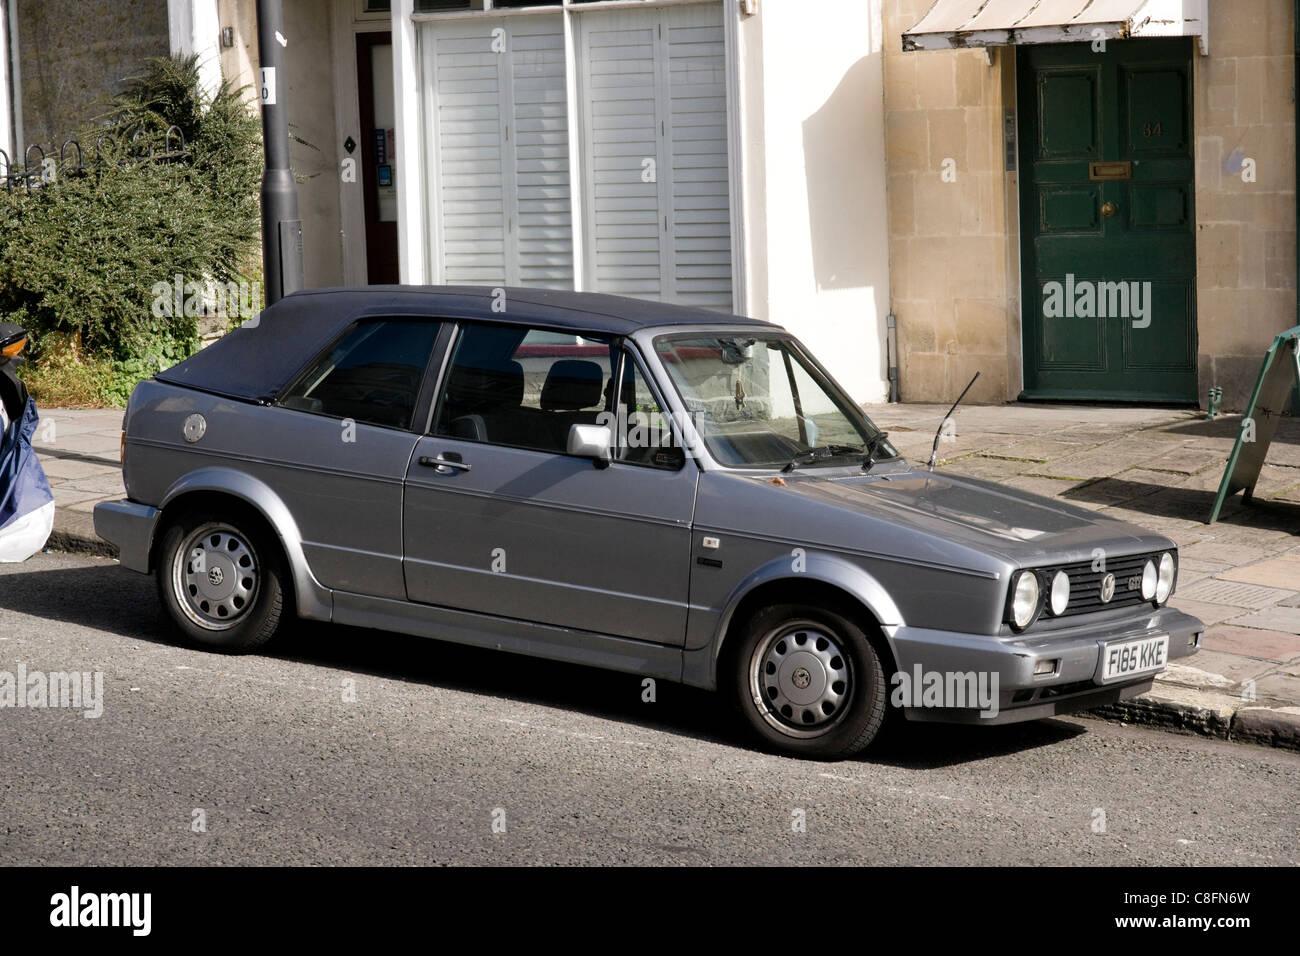 VW Golf Mark II cabriolet - Stock Image